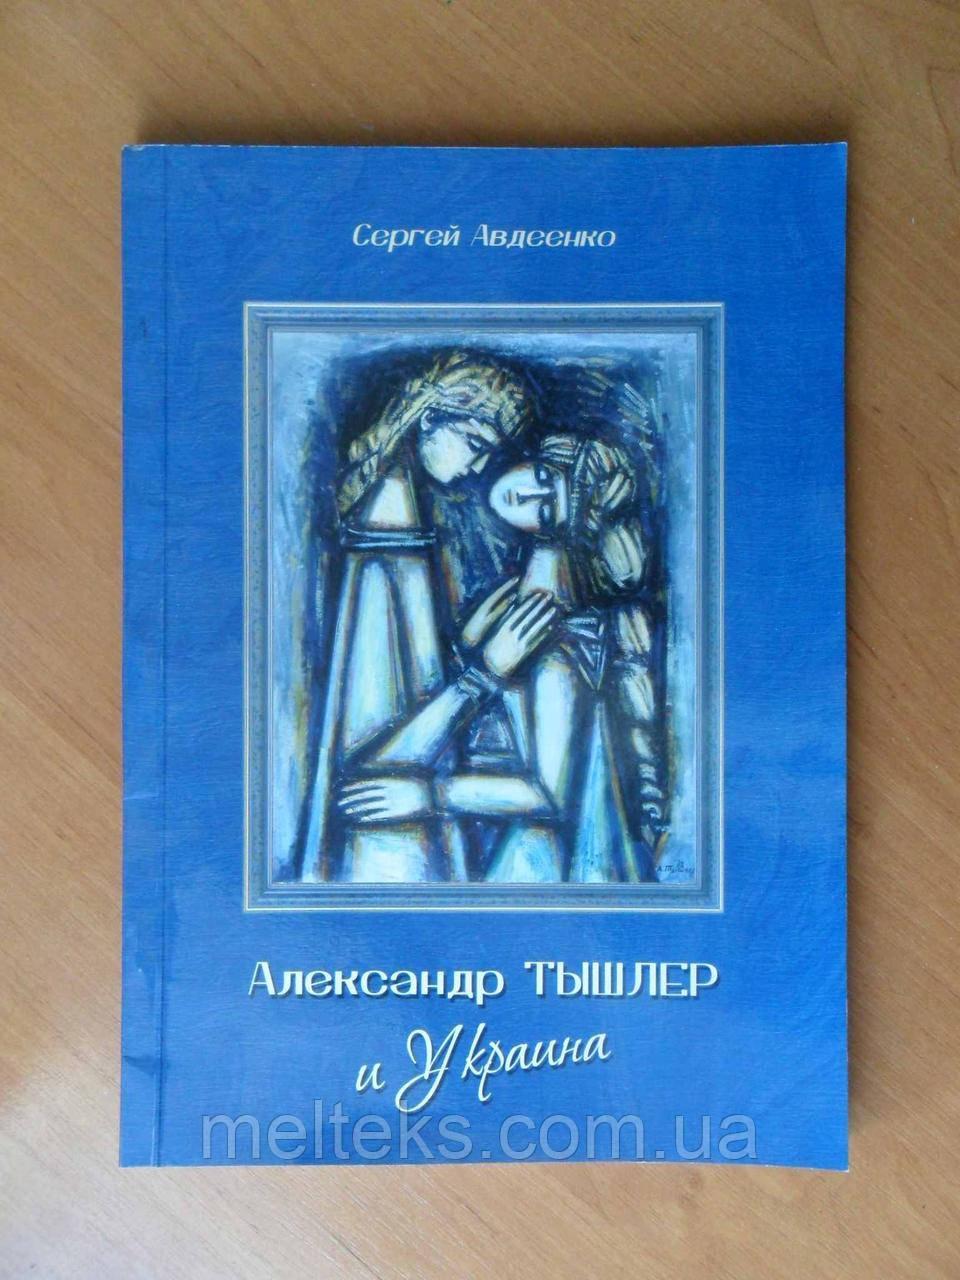 Александр Тышлер и Украина (книга Сергея Авдеенко)